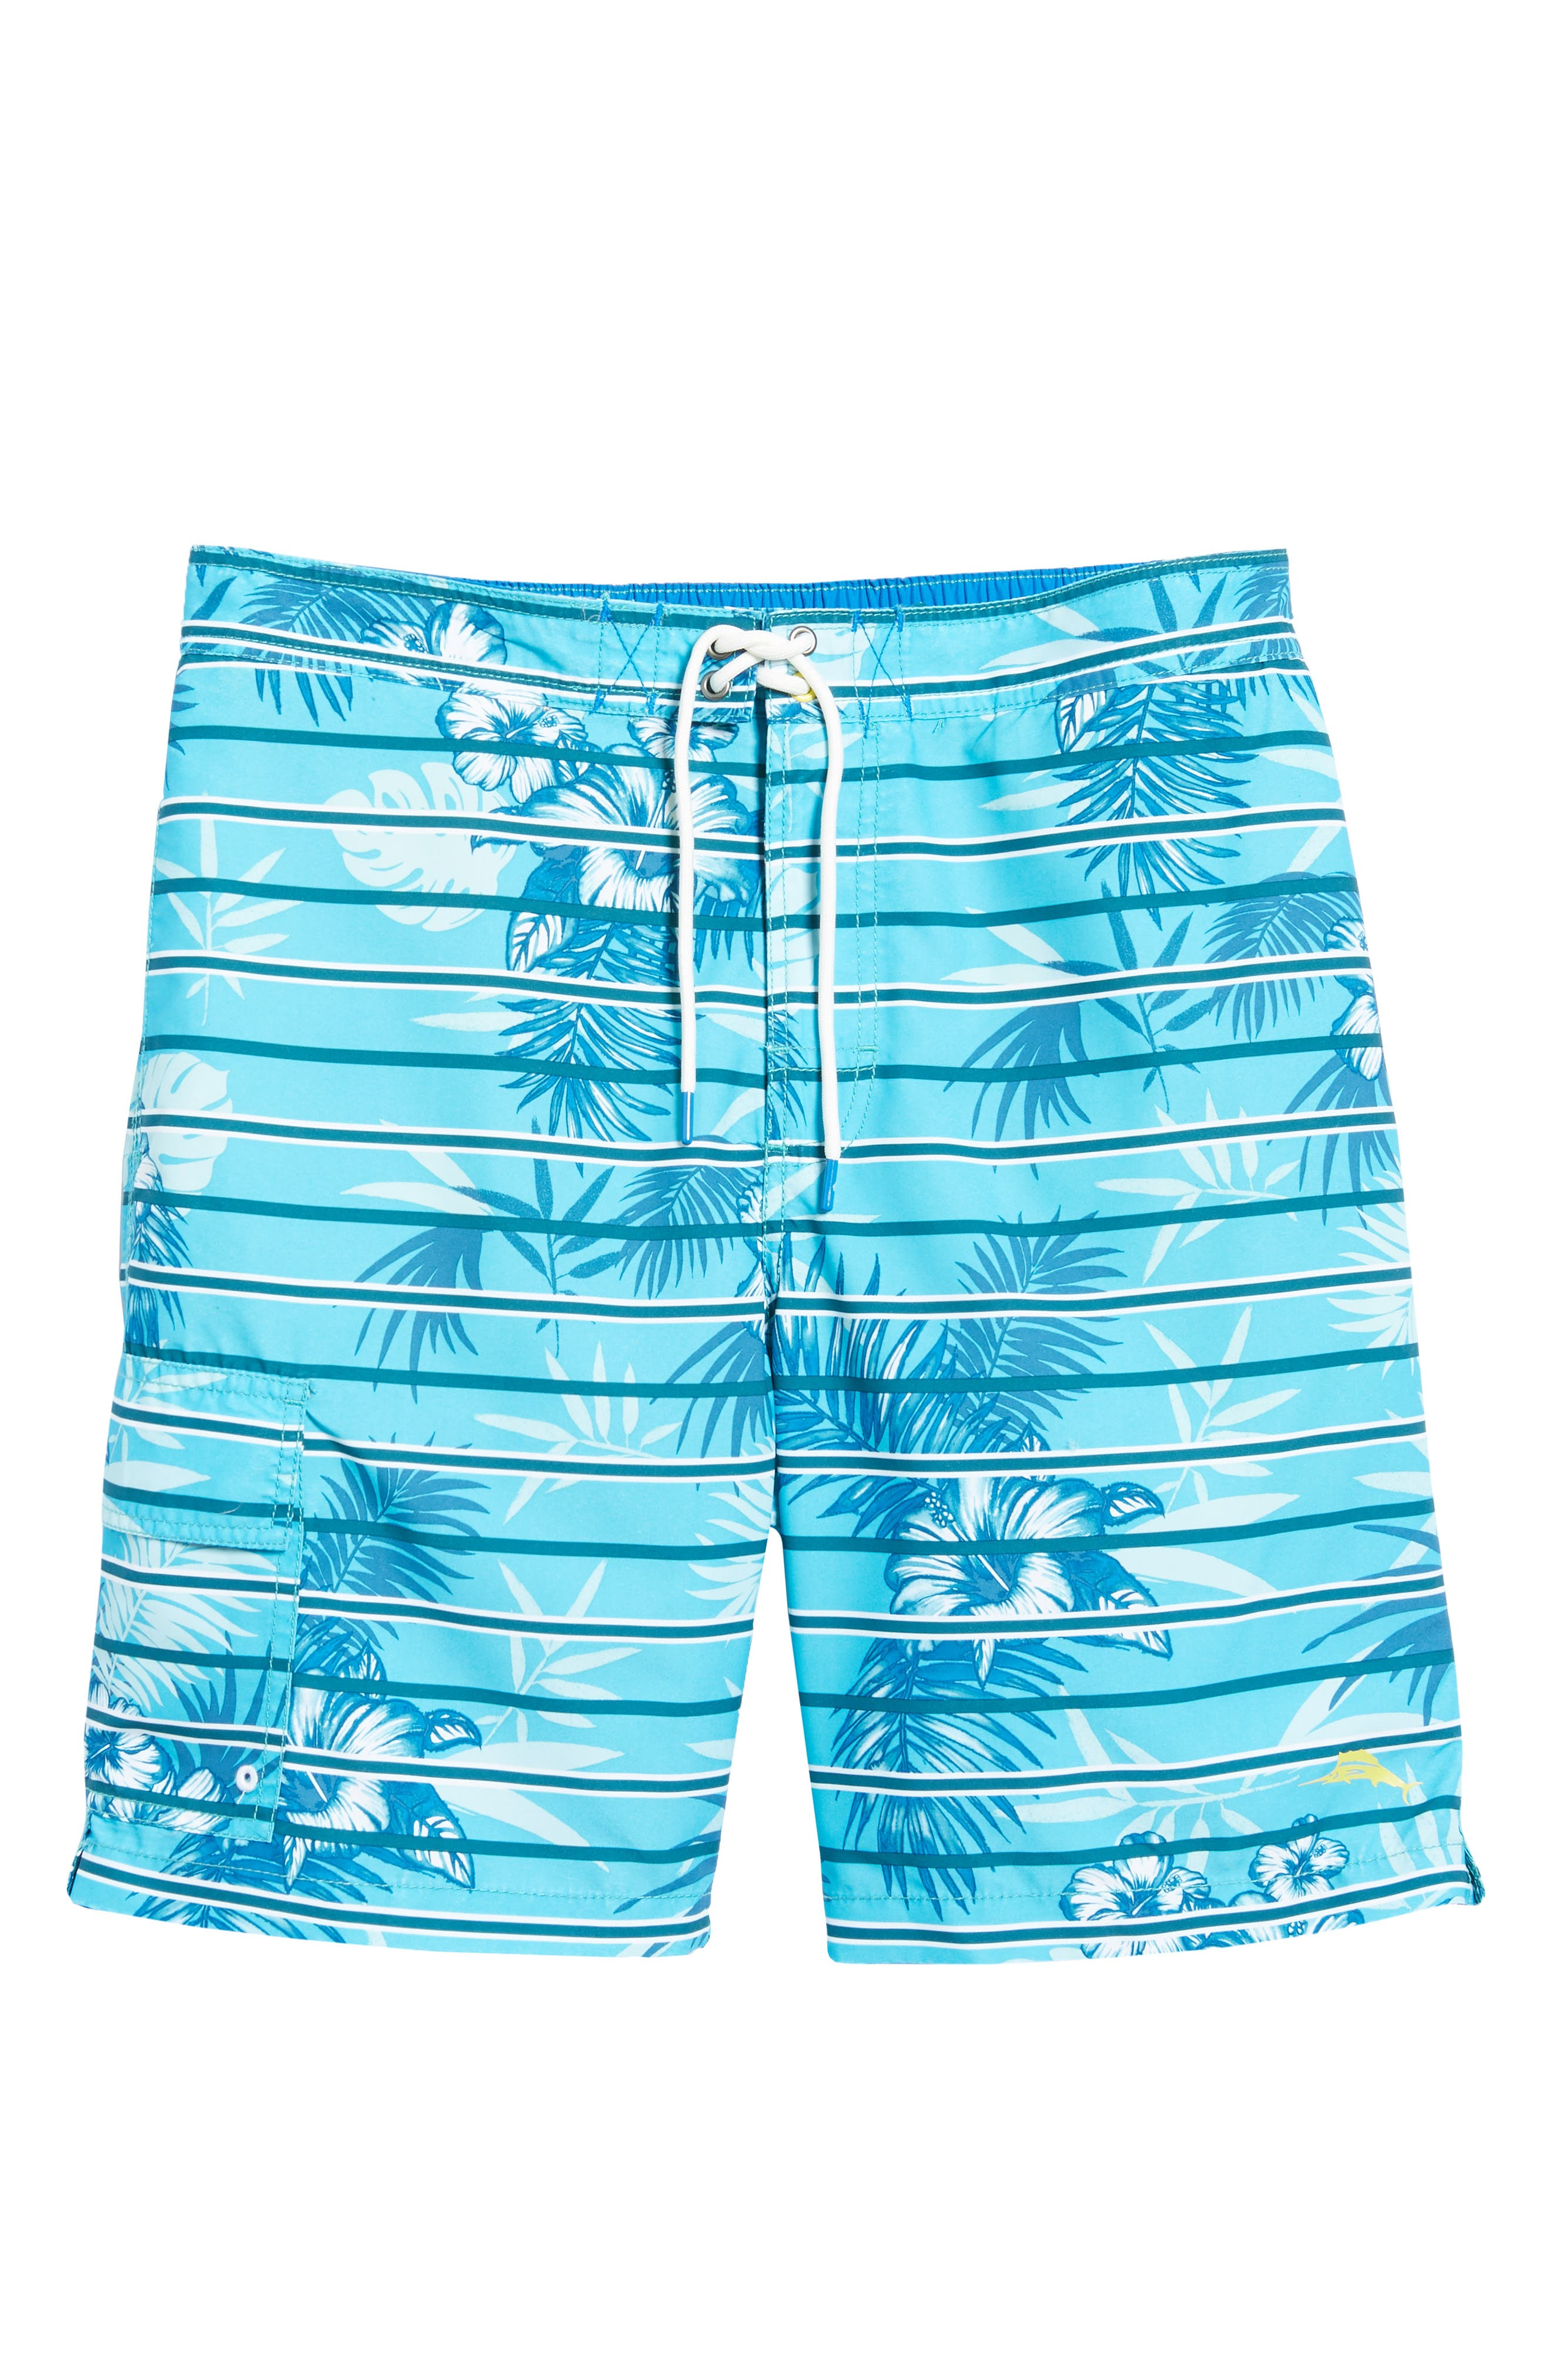 Baja Satillo Stripe Board Shorts,                             Alternate thumbnail 6, color,                             Blue Radiance